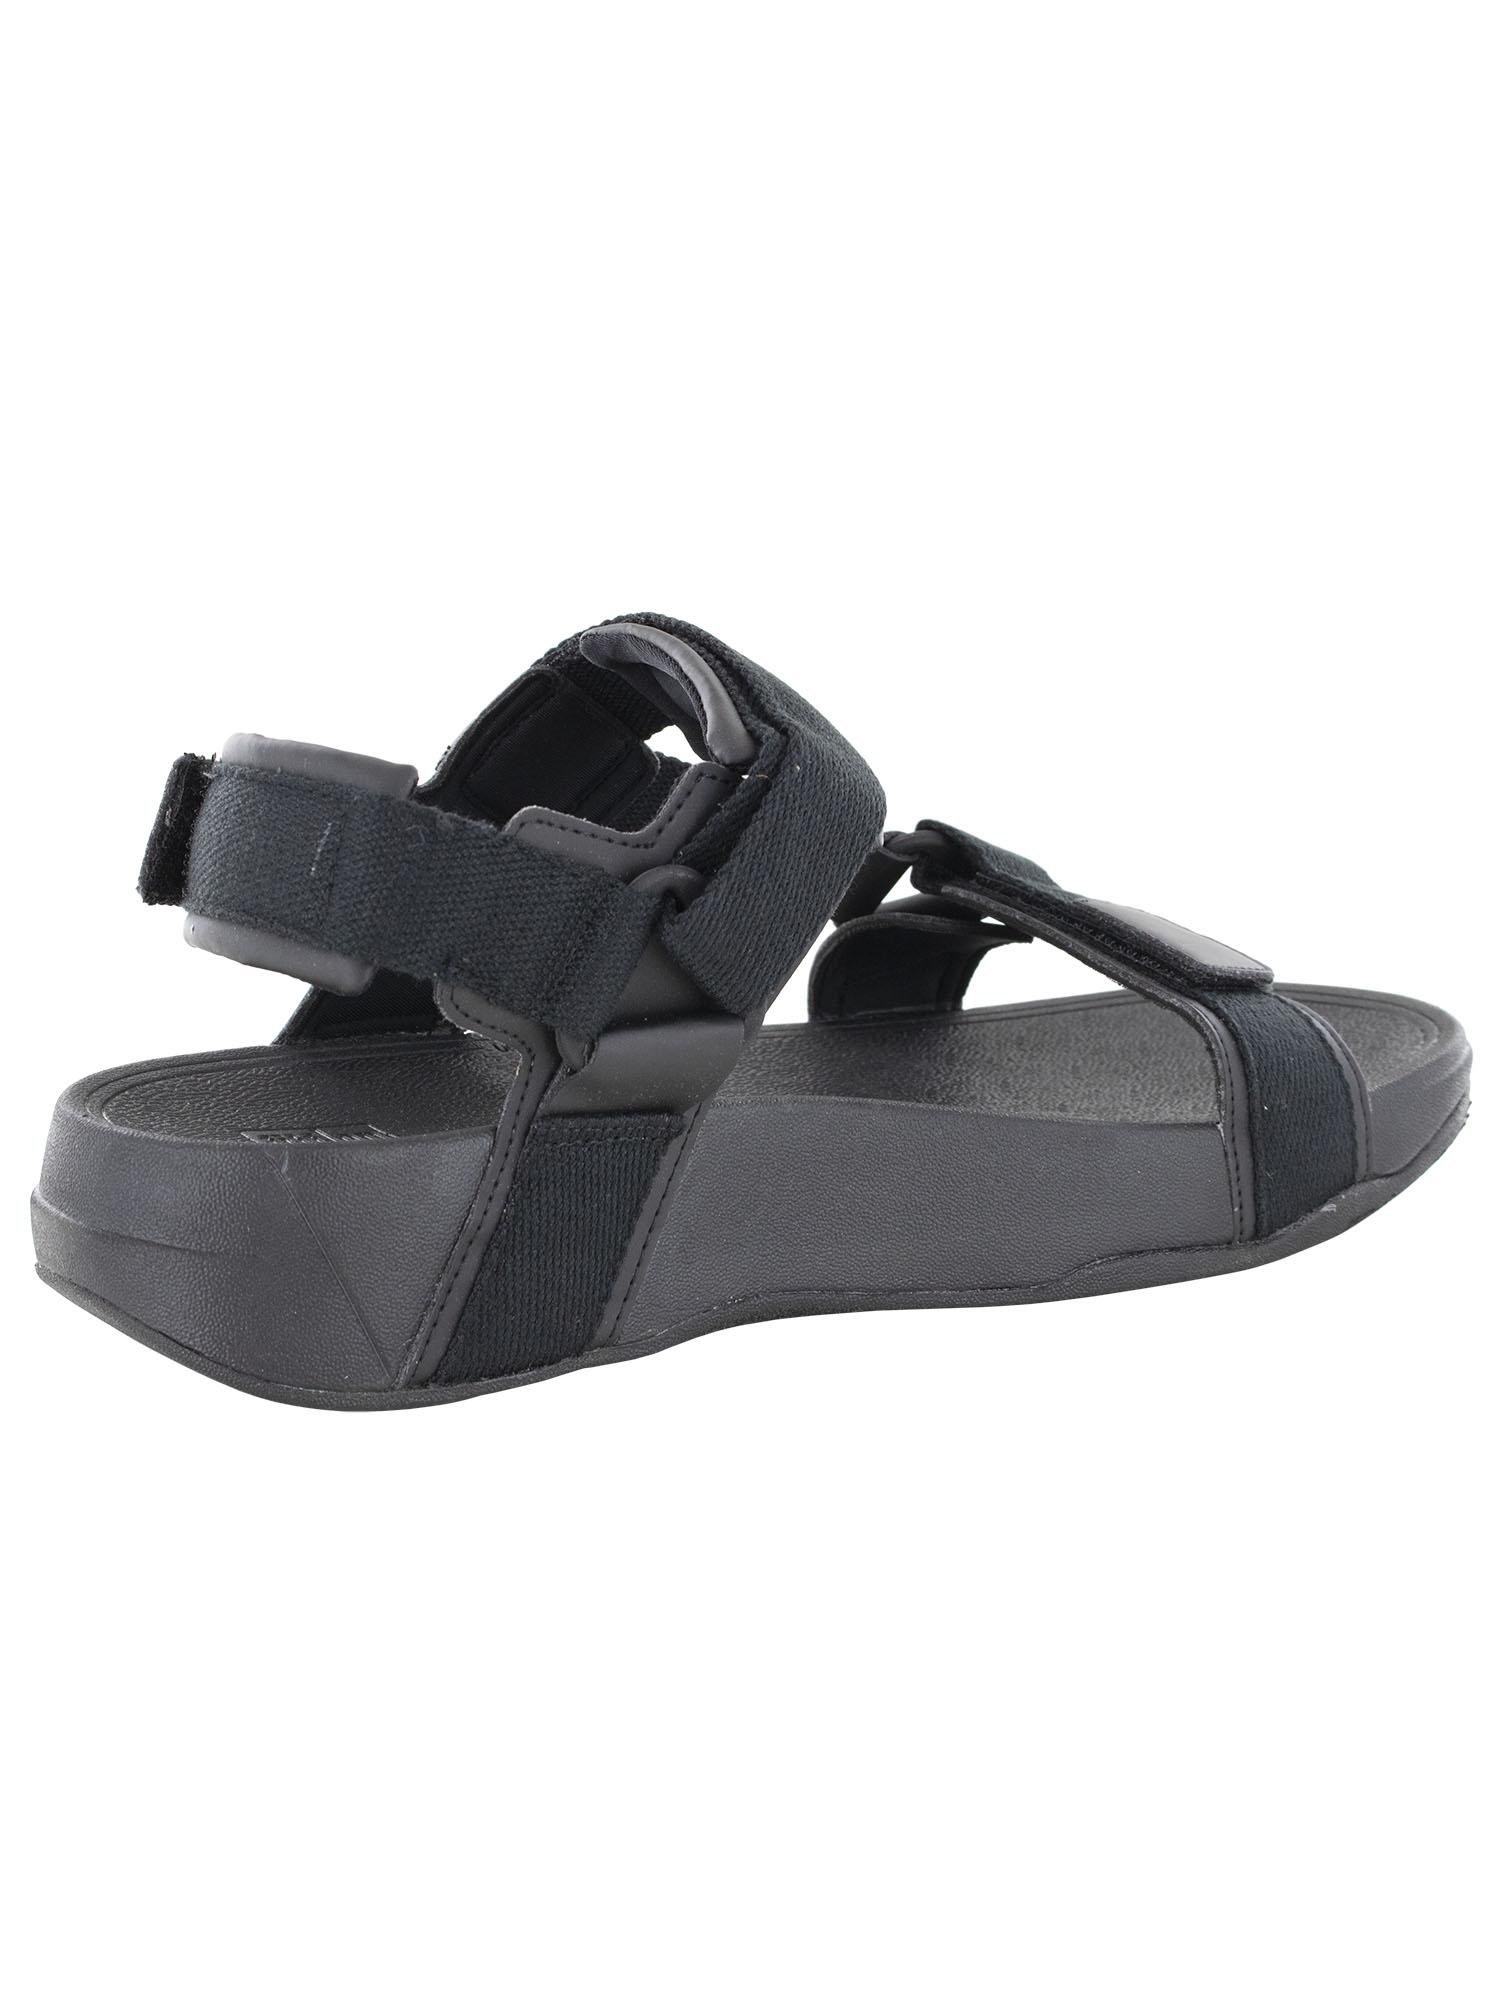 thumbnail 4 - Fitflop-Mens-Ryker-Webbing-Athletic-Sandal-Shoes